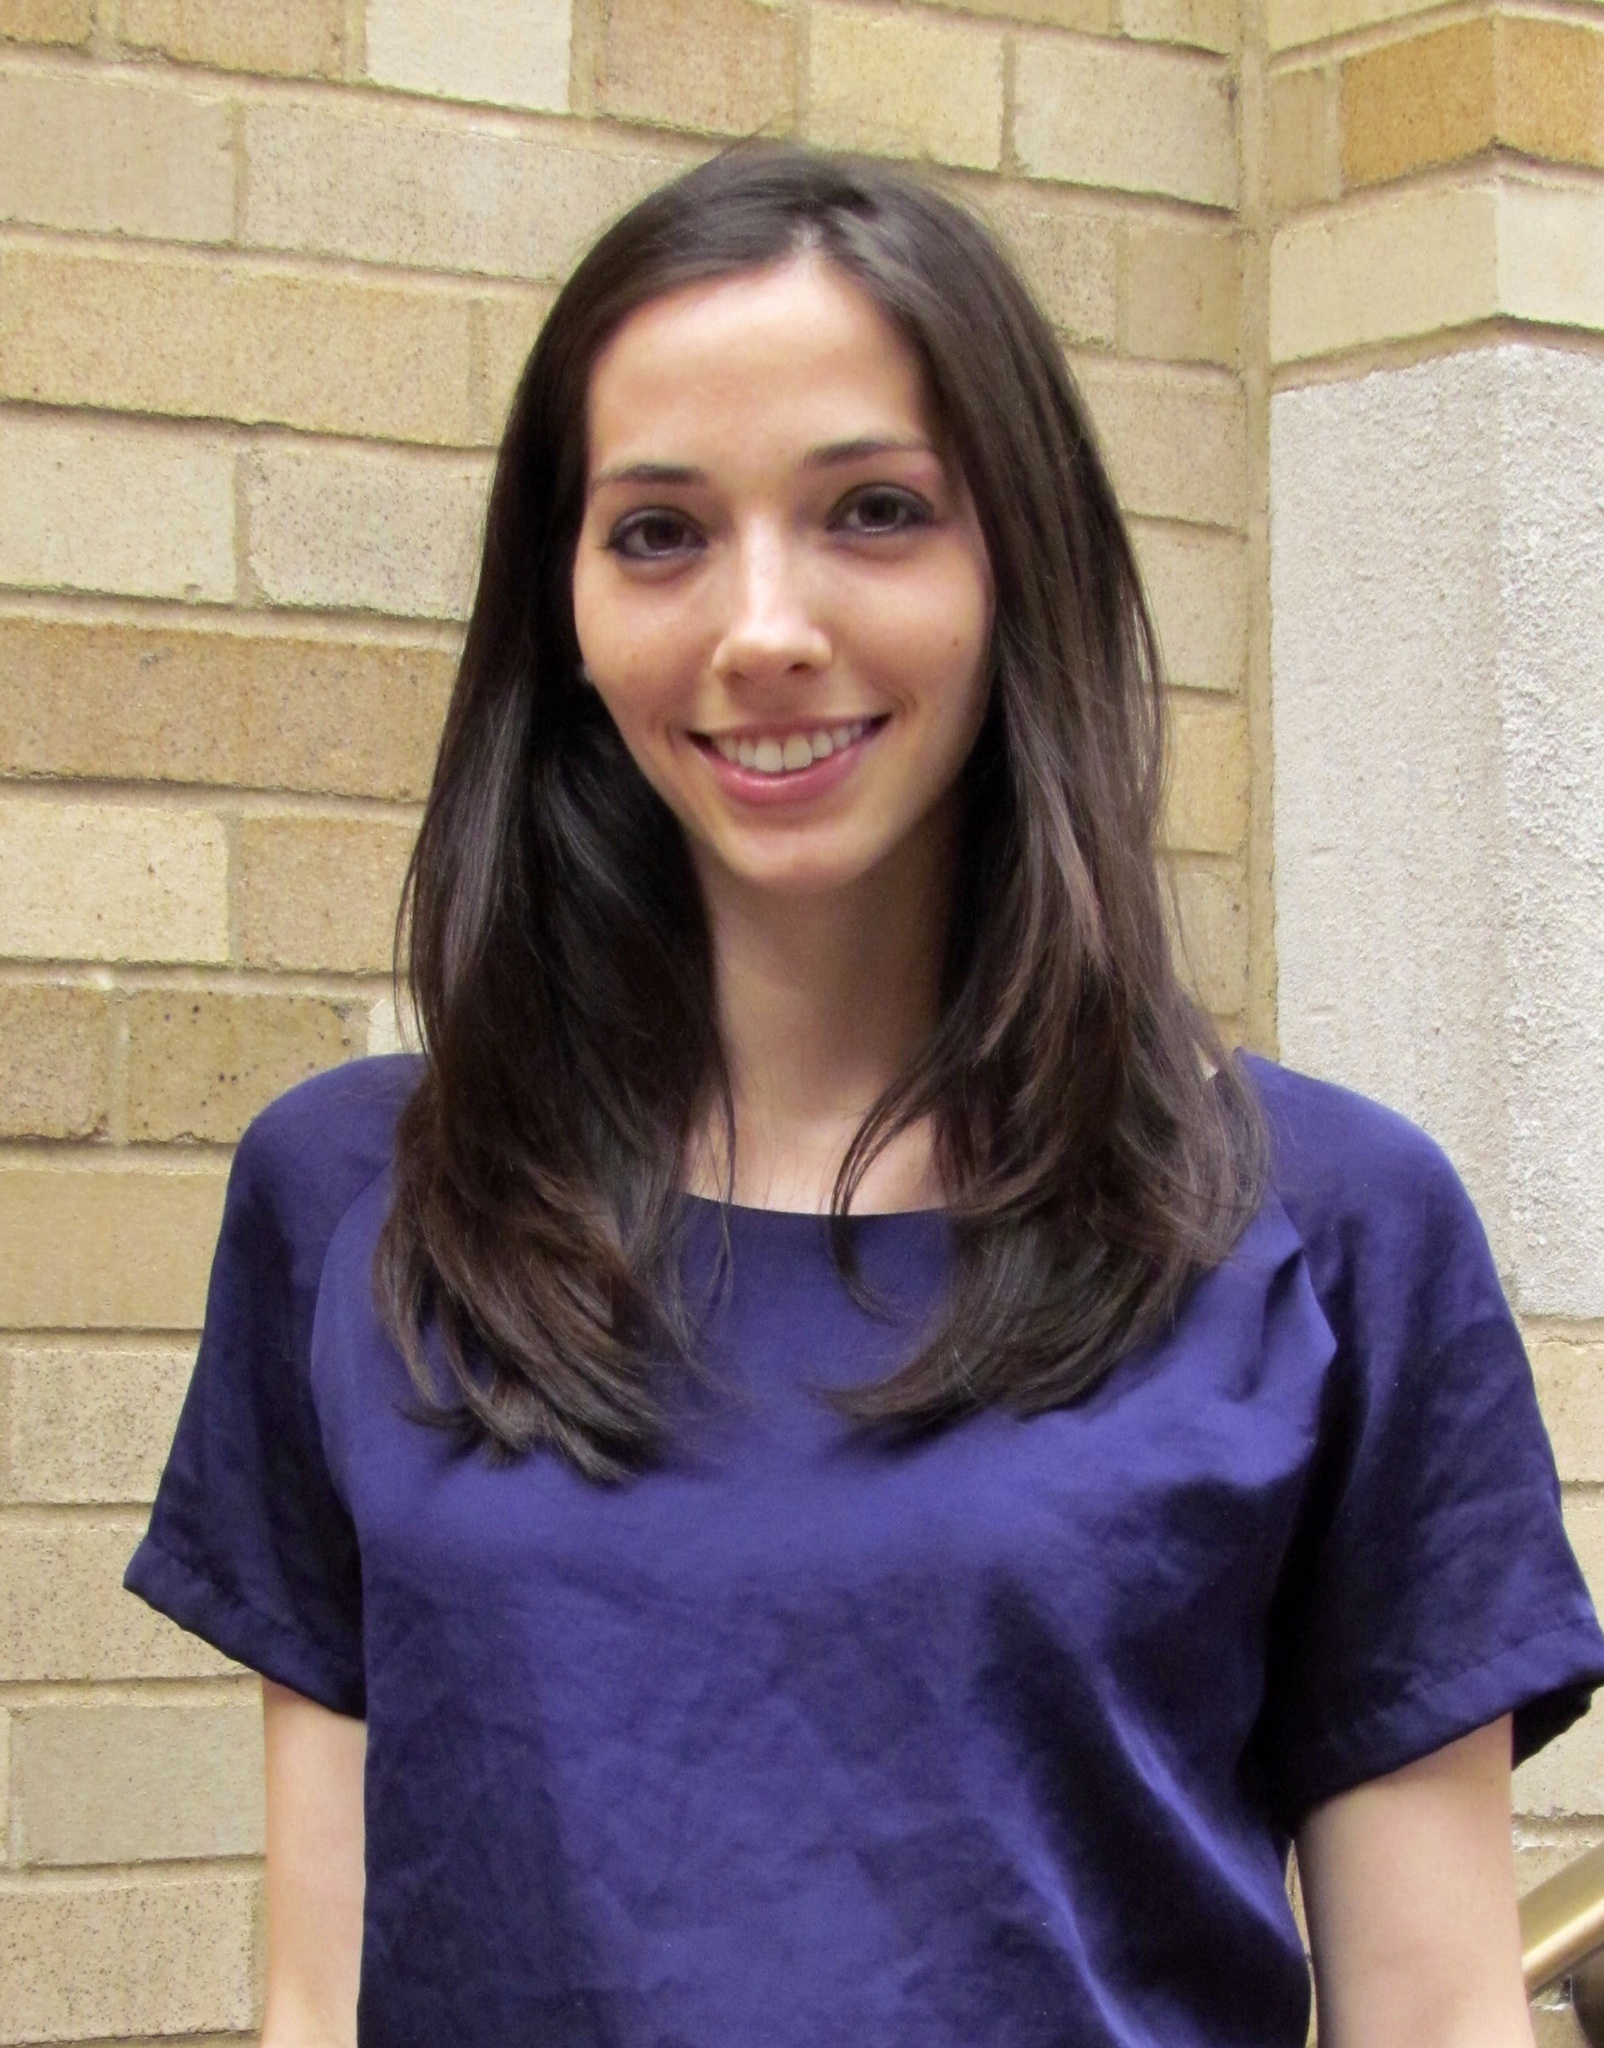 Madeline Goldberg